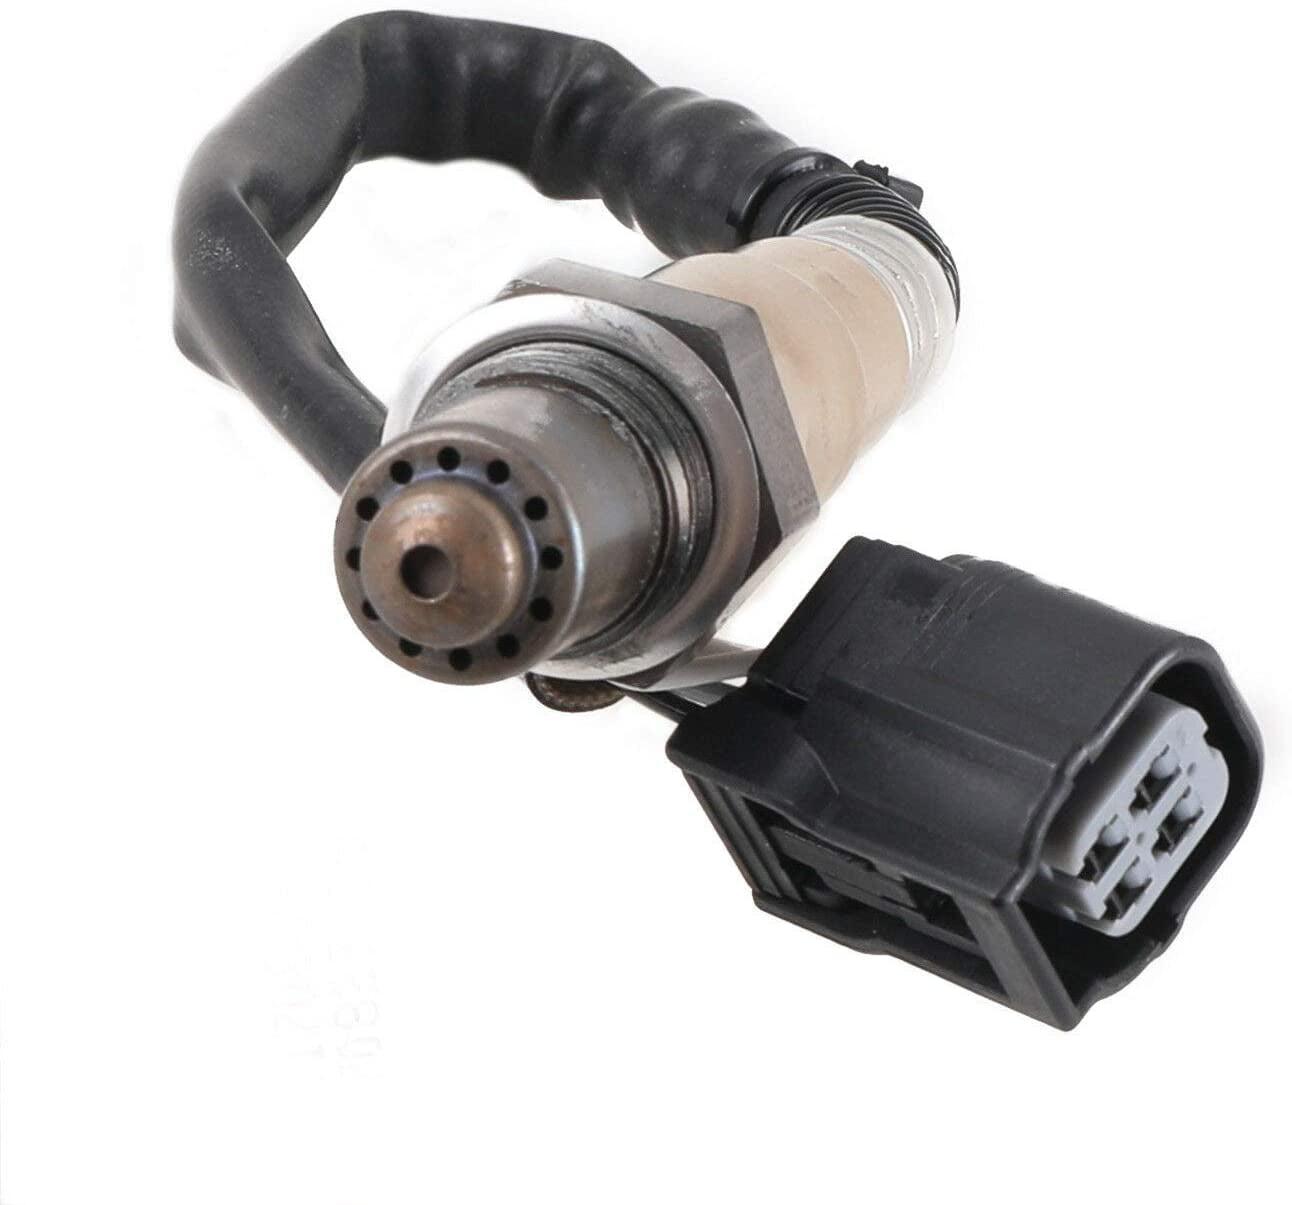 Downstream O2 Oxygen Sensor For 2009-2014 Acura TSX 2.4L